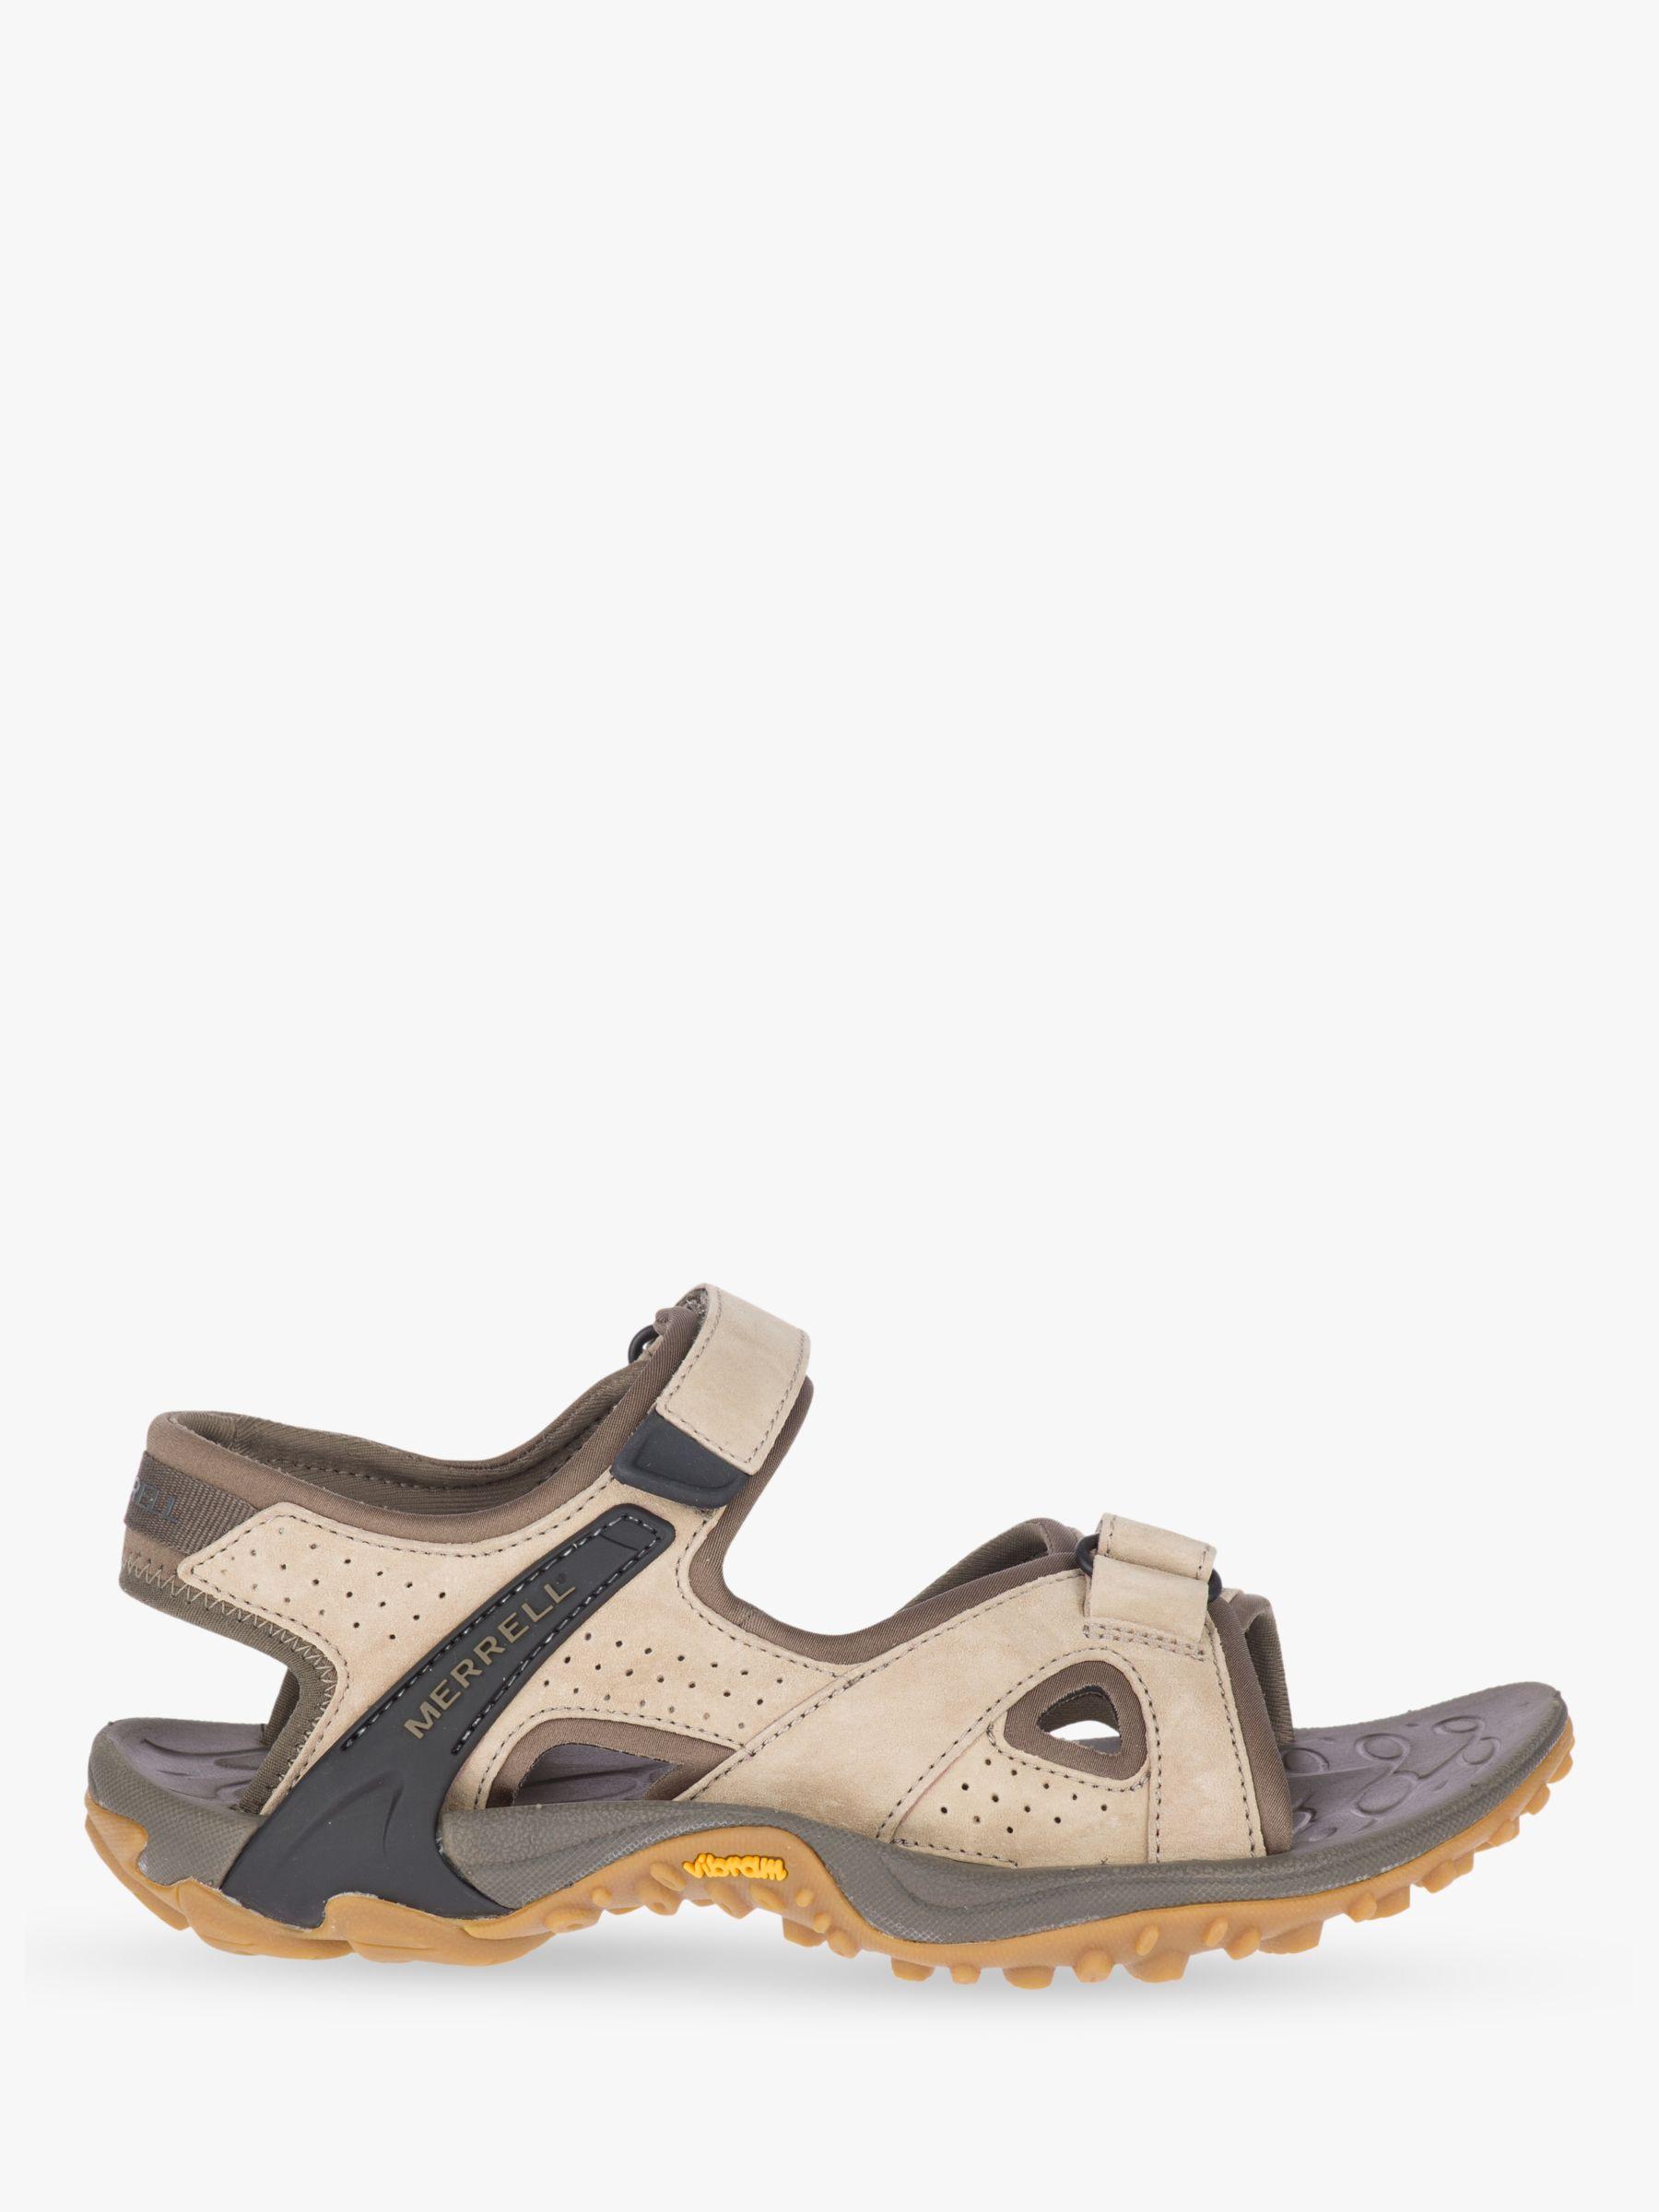 Merrell Merrell Kahuna 4 Women's Walking Sandals, Classic Taupe